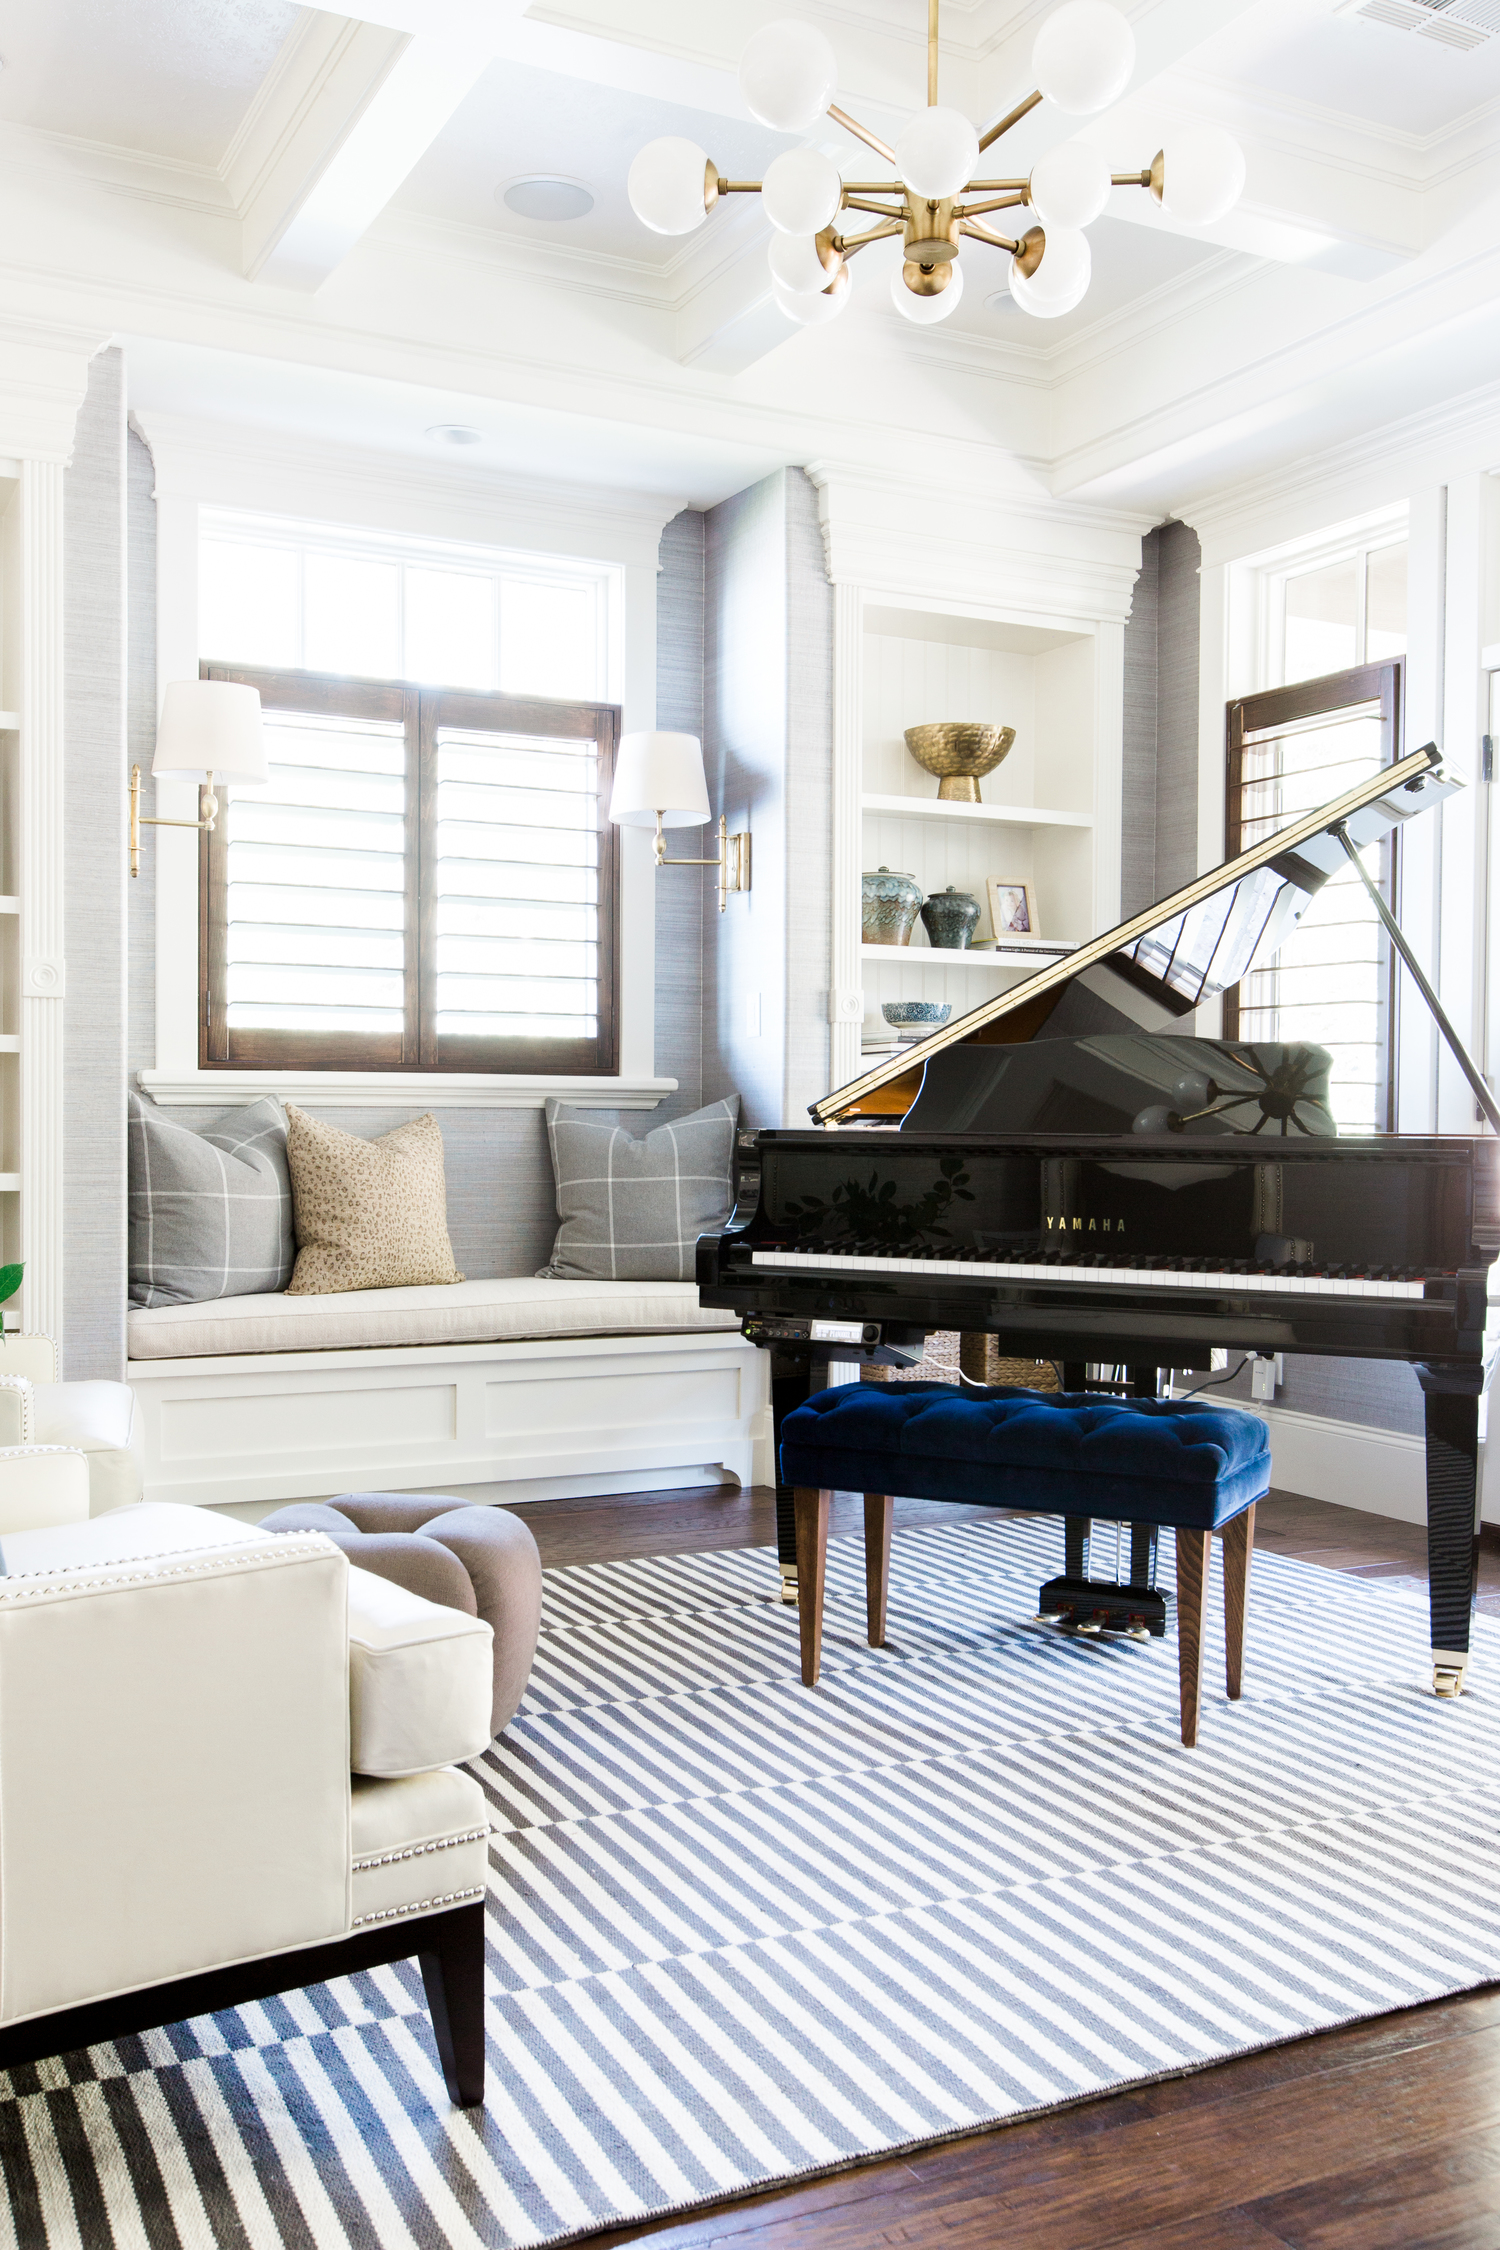 Mountainside+Remodel+Piano+Room+--+Studio+McGee.jpg